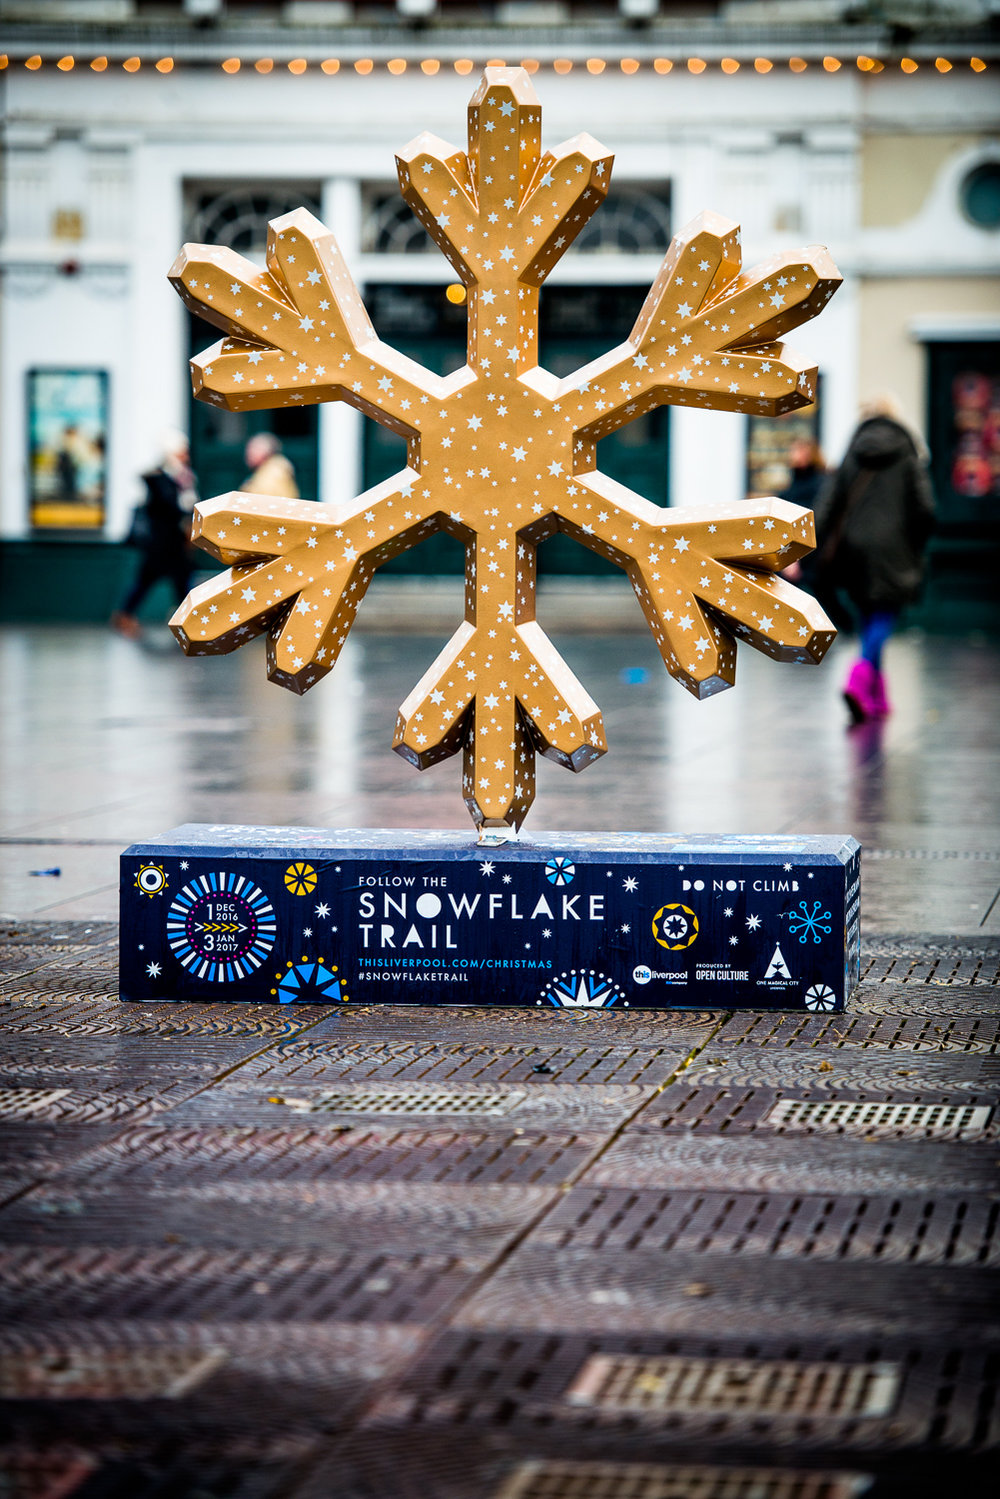 liverpool_snowflake_trail-8.jpg